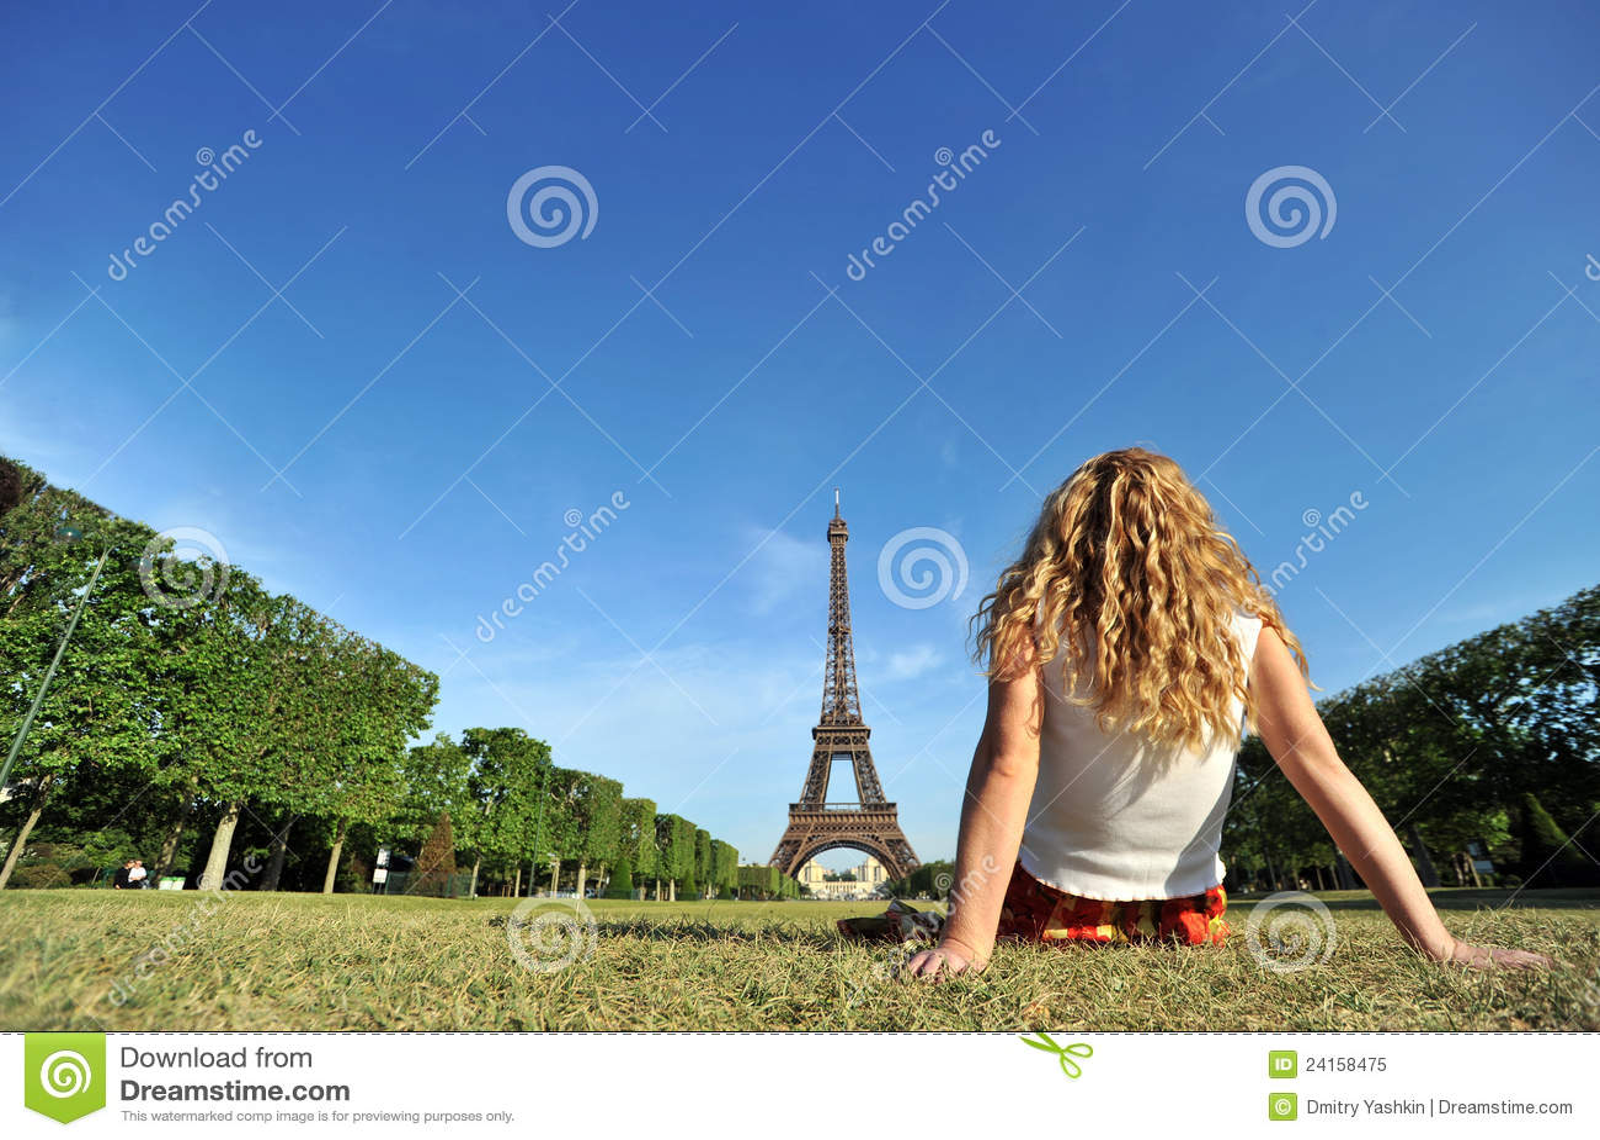 Young woman relaxing in Paris